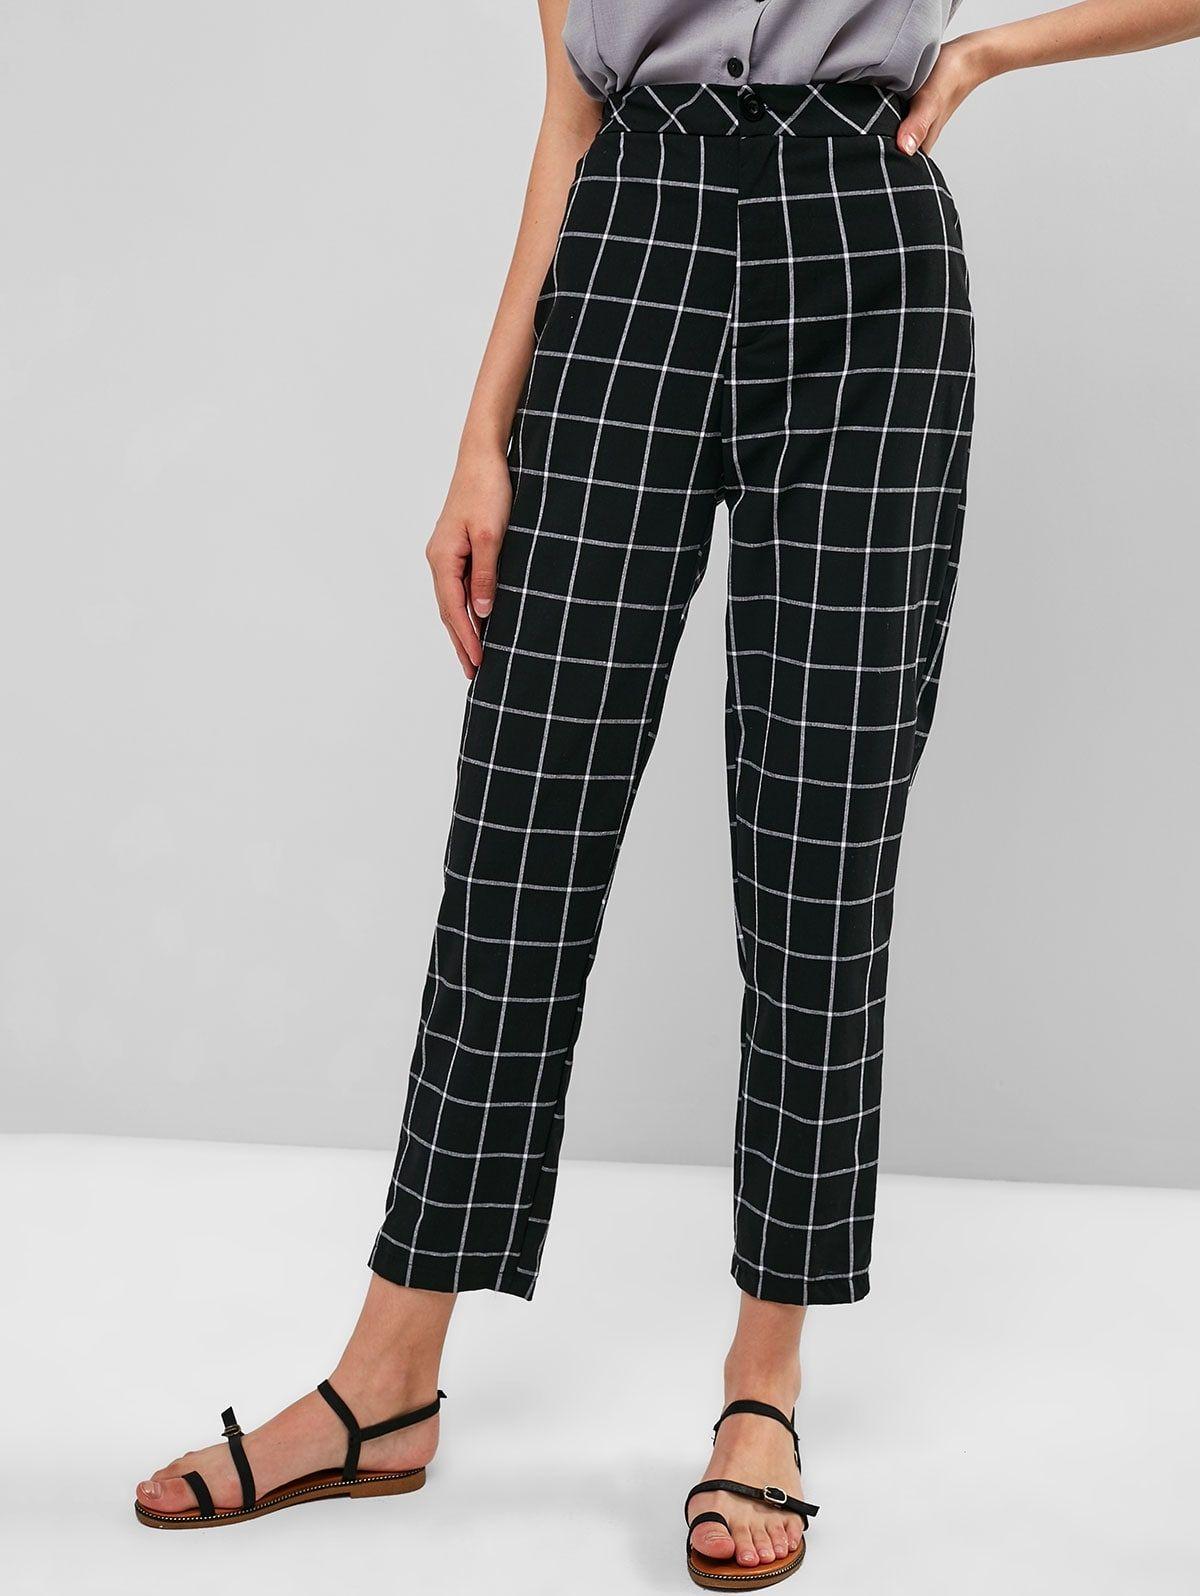 High Waist Zipper Checkered Pants Black Affiliate Zipper Waist High Black Pants Ad Checker Pants Fashion Pants Black Pants